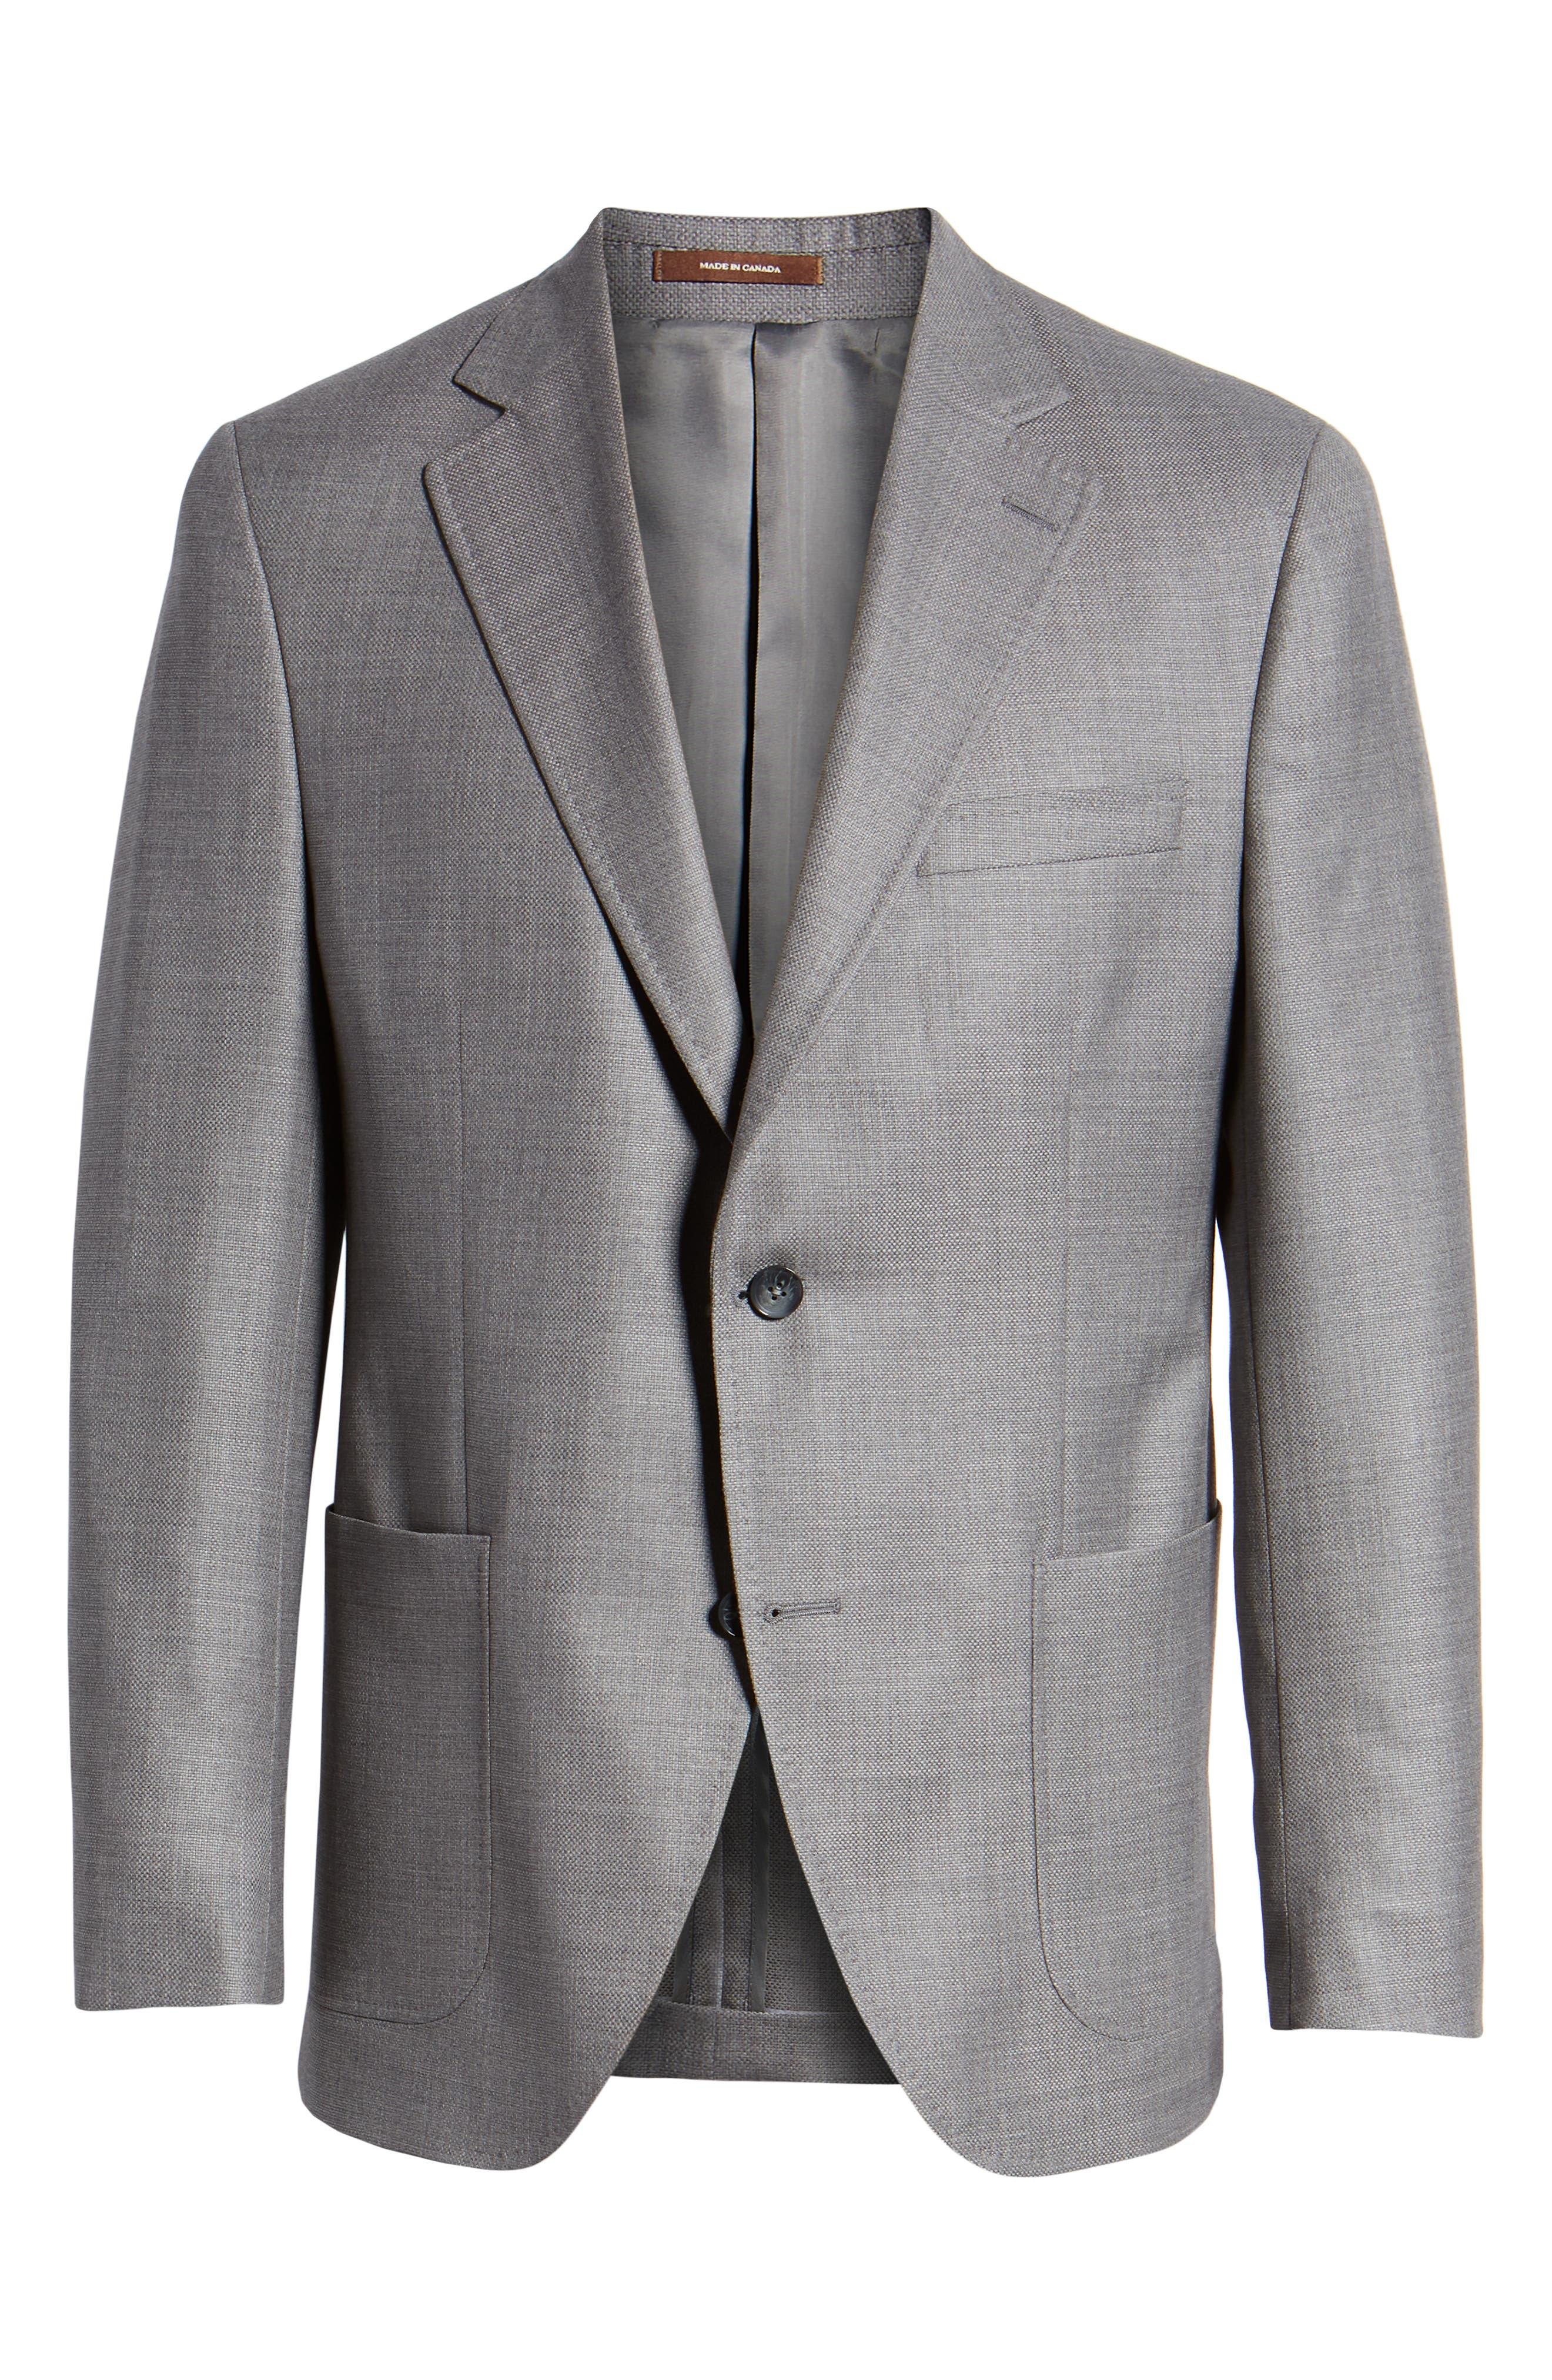 PETER MILLAR,                             Hyperlight Classic Fit Wool Sport Coat,                             Alternate thumbnail 5, color,                             020